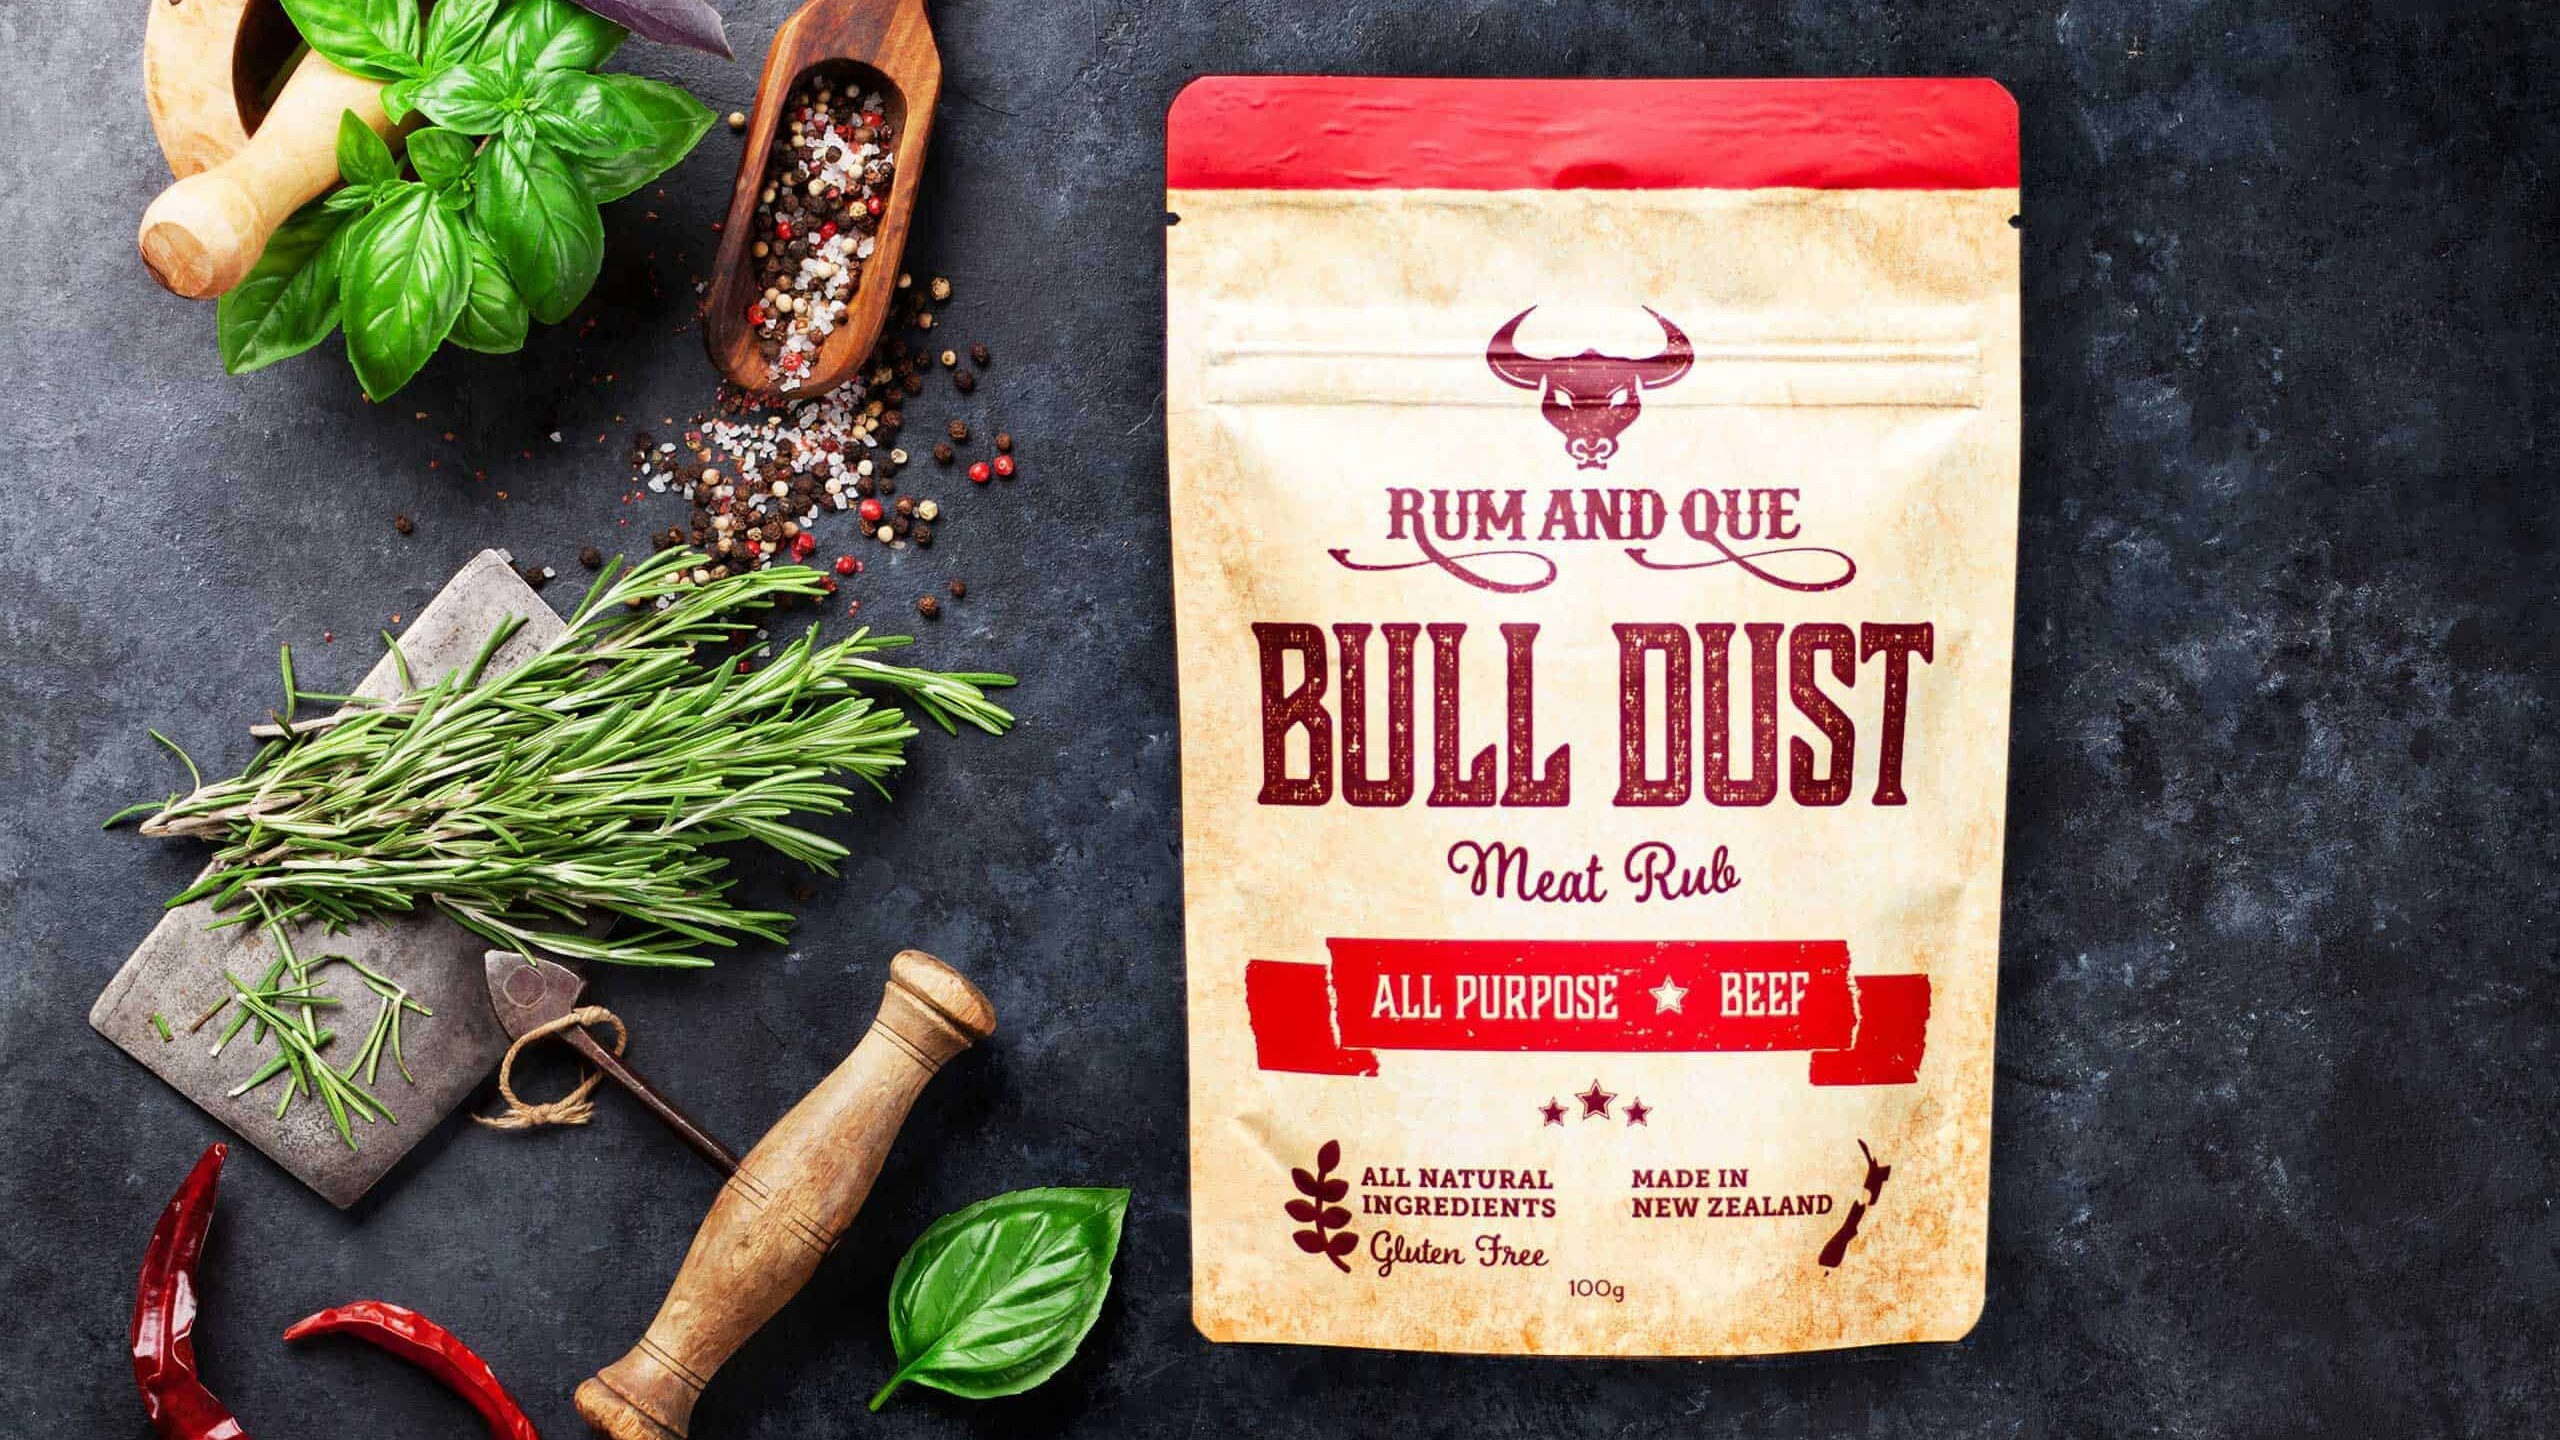 Rum & Que Bull Dust Meat Rub